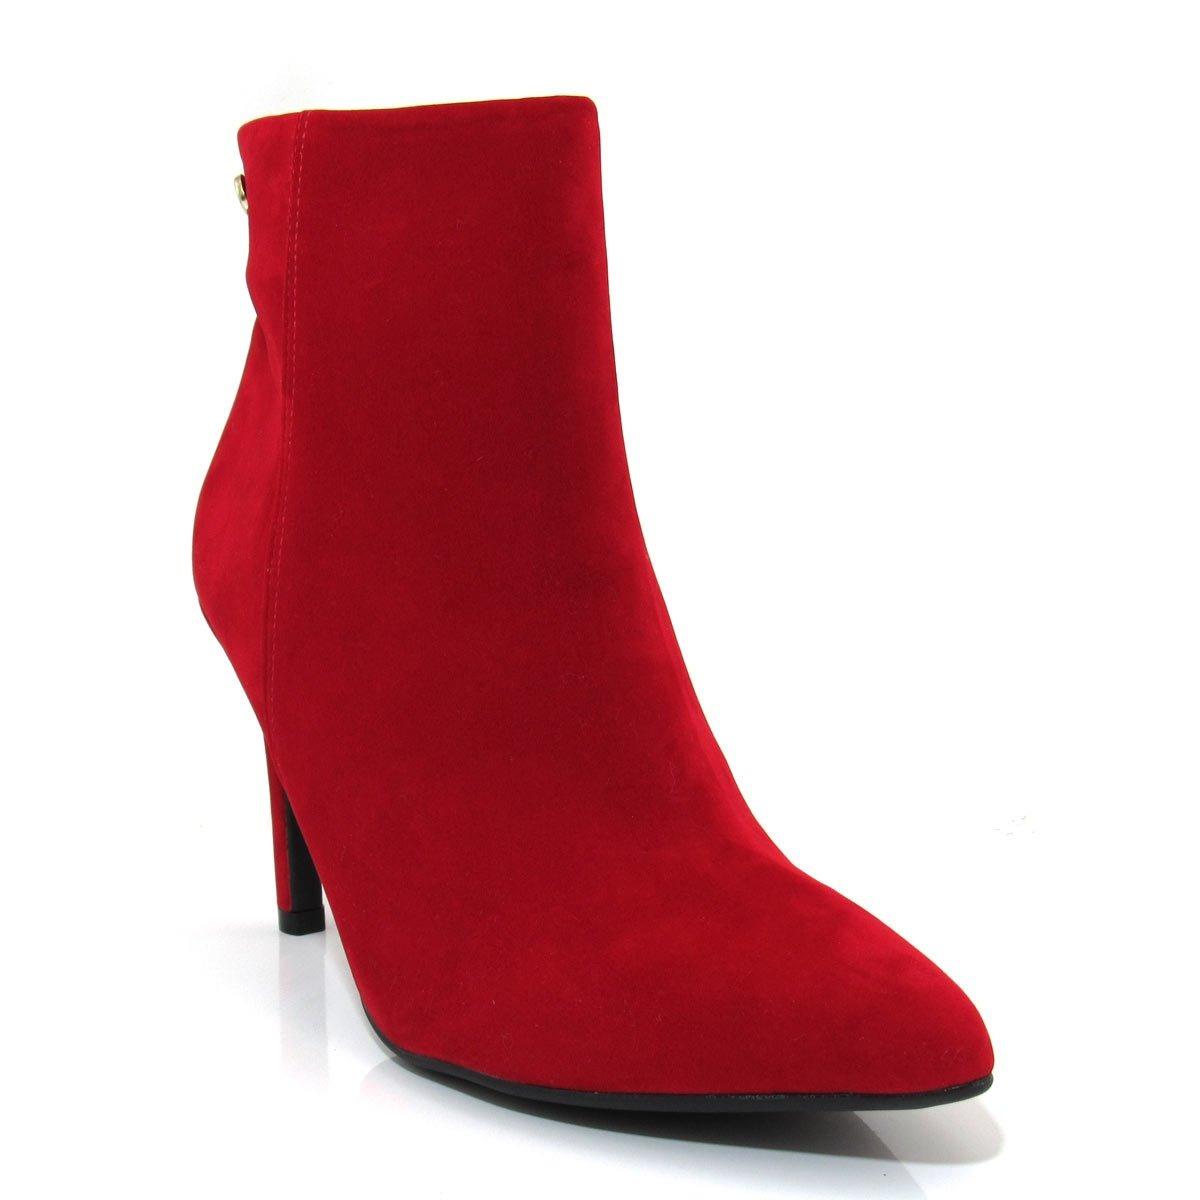 2d0c2bf418 bota vermelha cano curto feminina bico fino vizzano 3049219. Carregando  zoom.